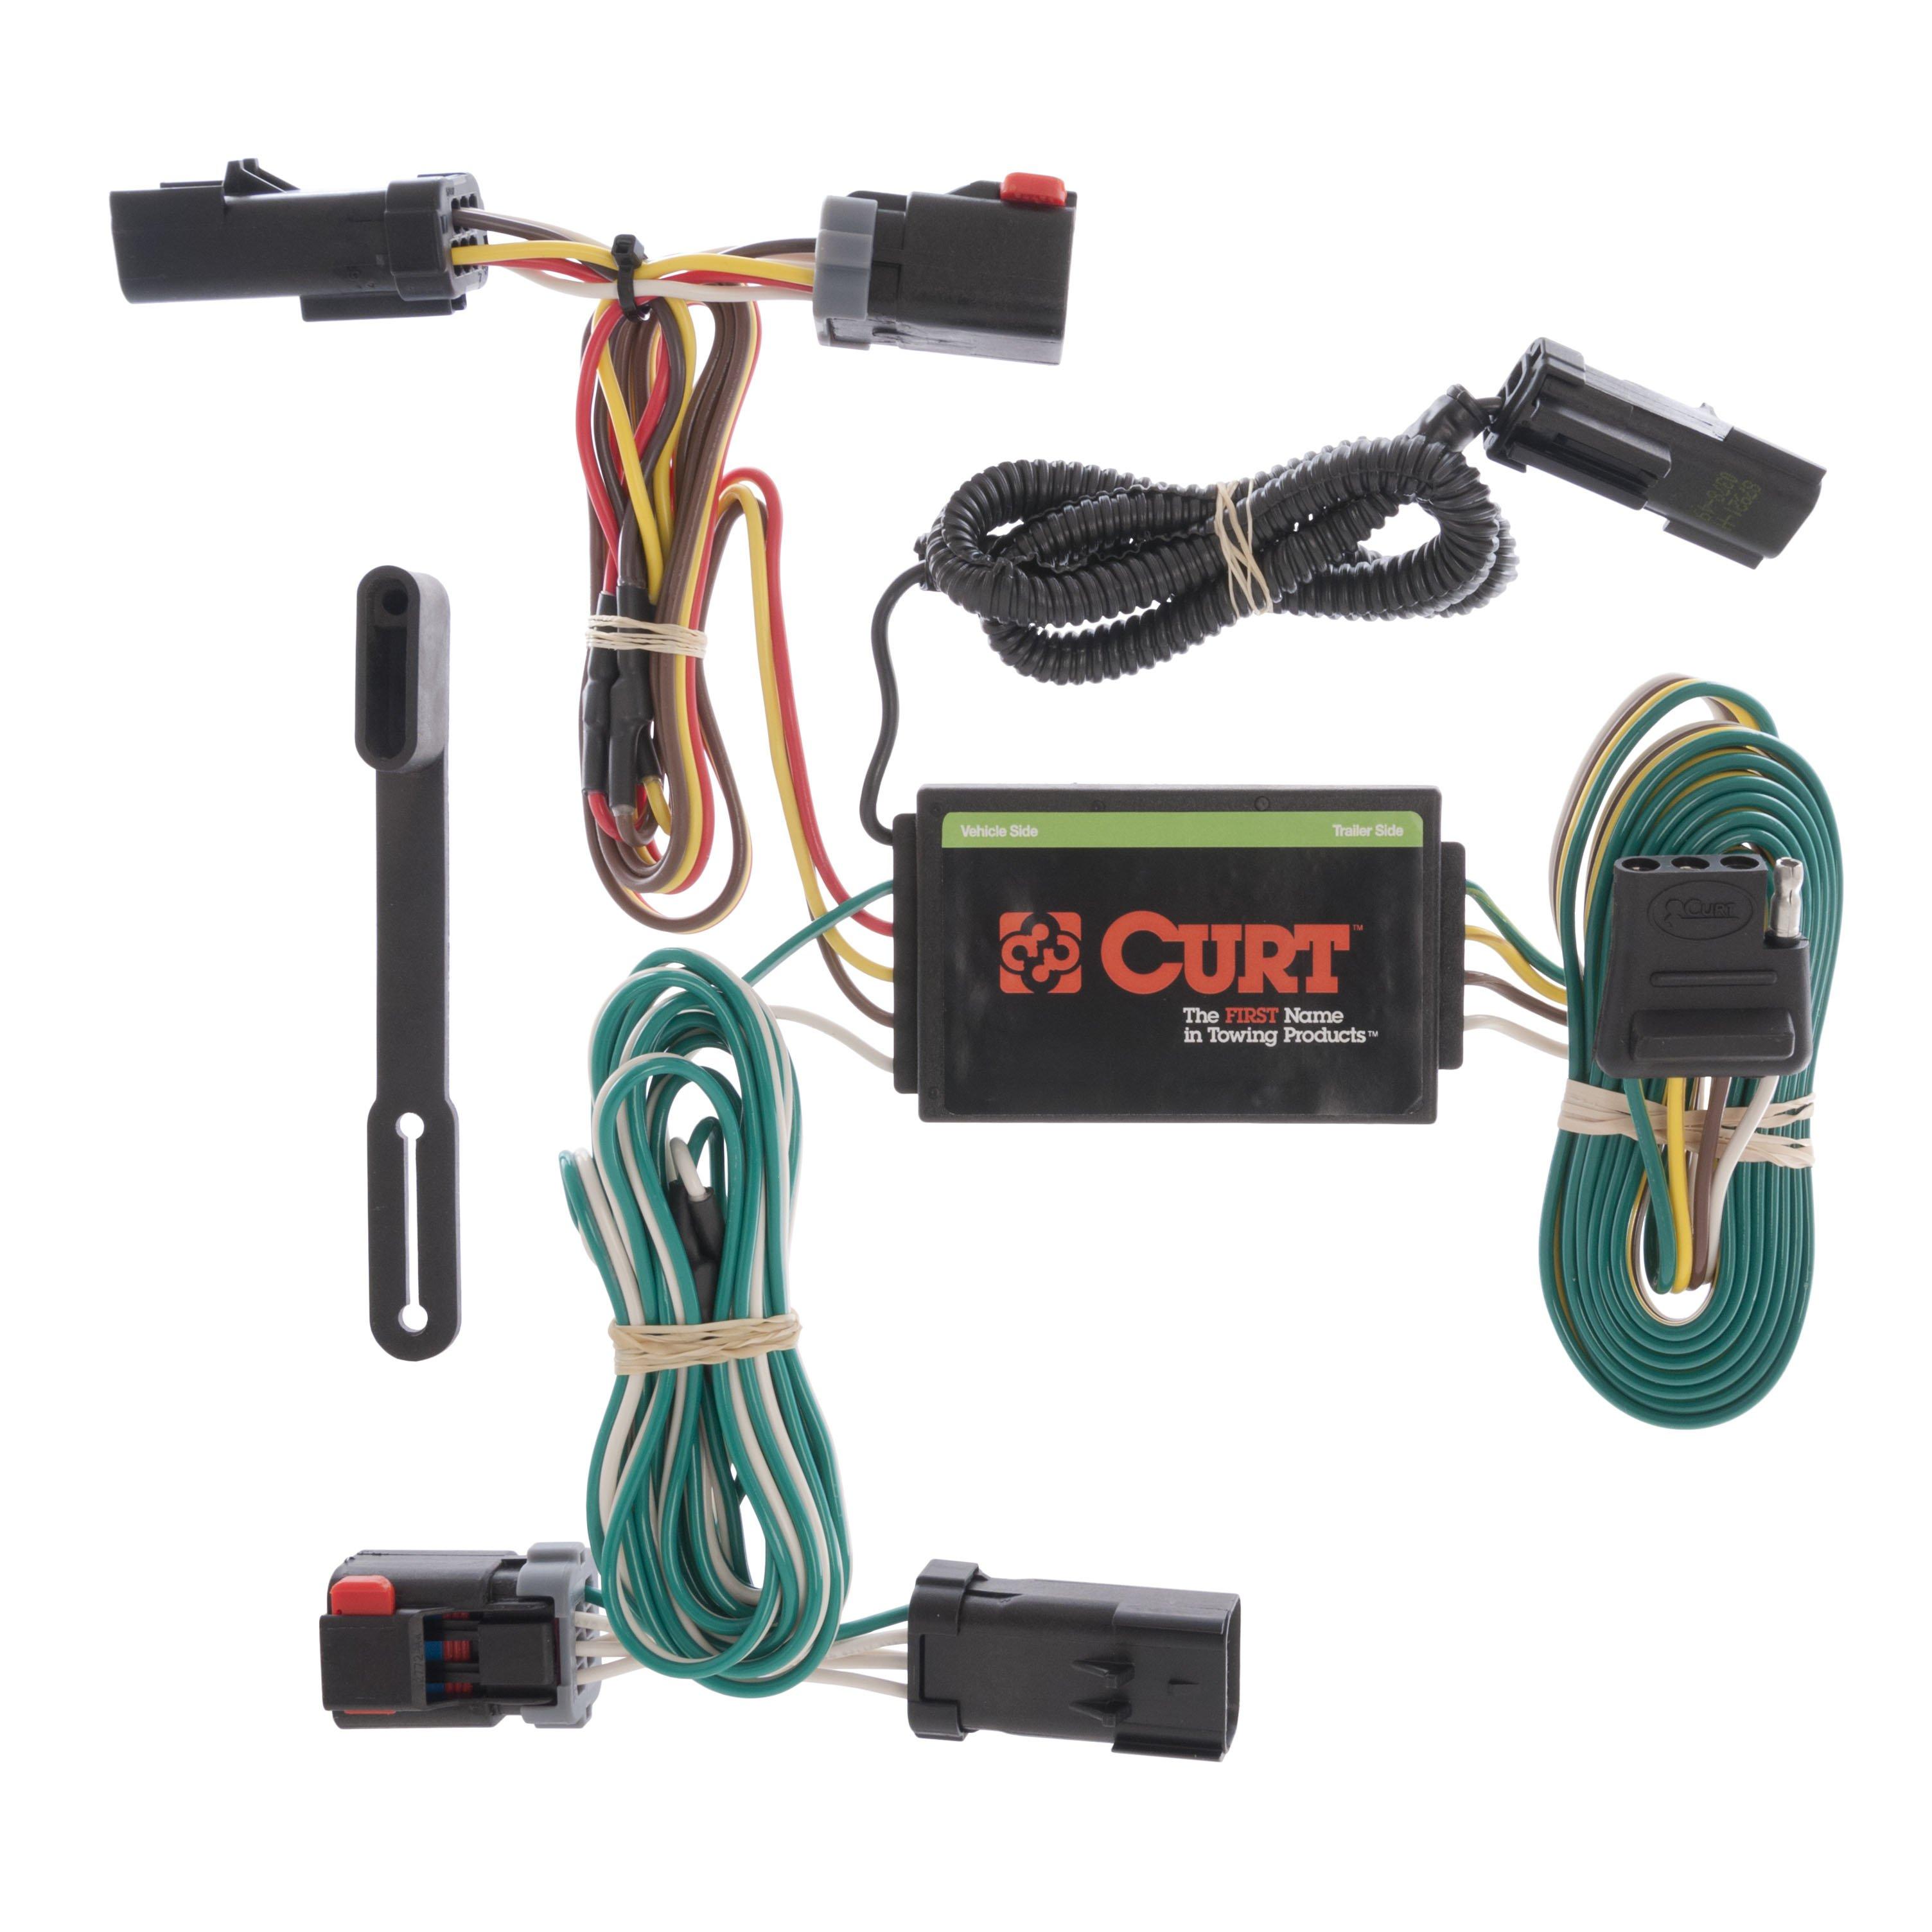 CURT Custom VehicletoTrailer Wiring Harness 55530 for 0408